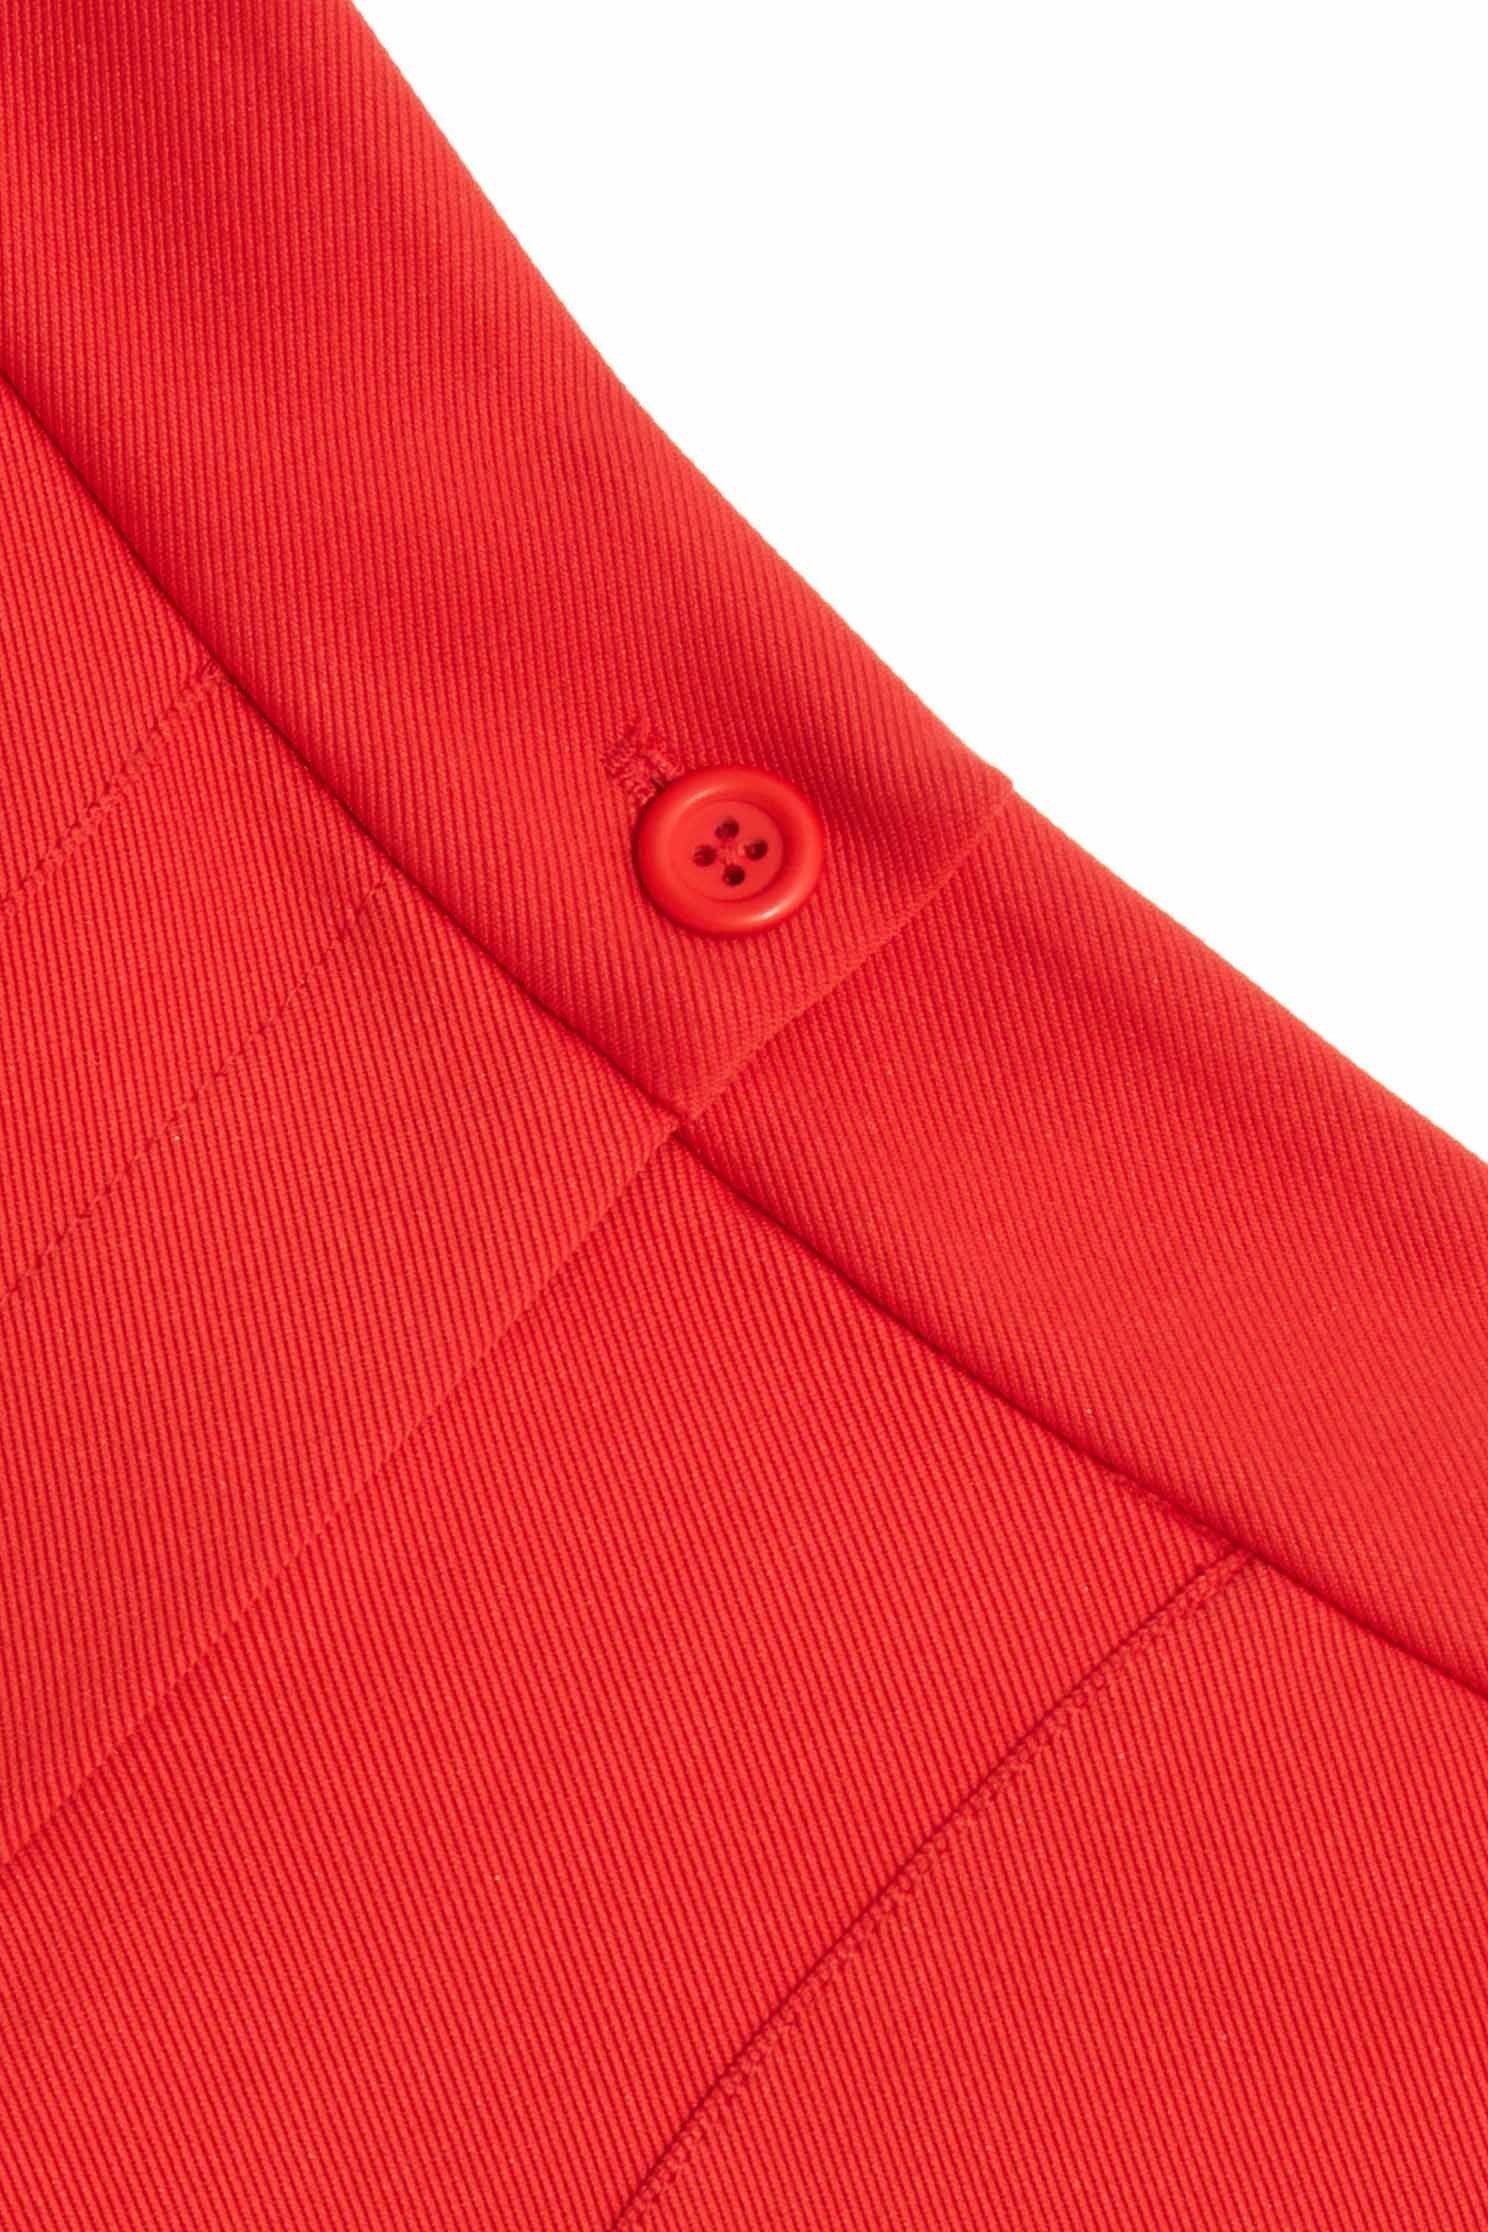 Orange shorts,Season (SS) Look,Shorts,Knitted